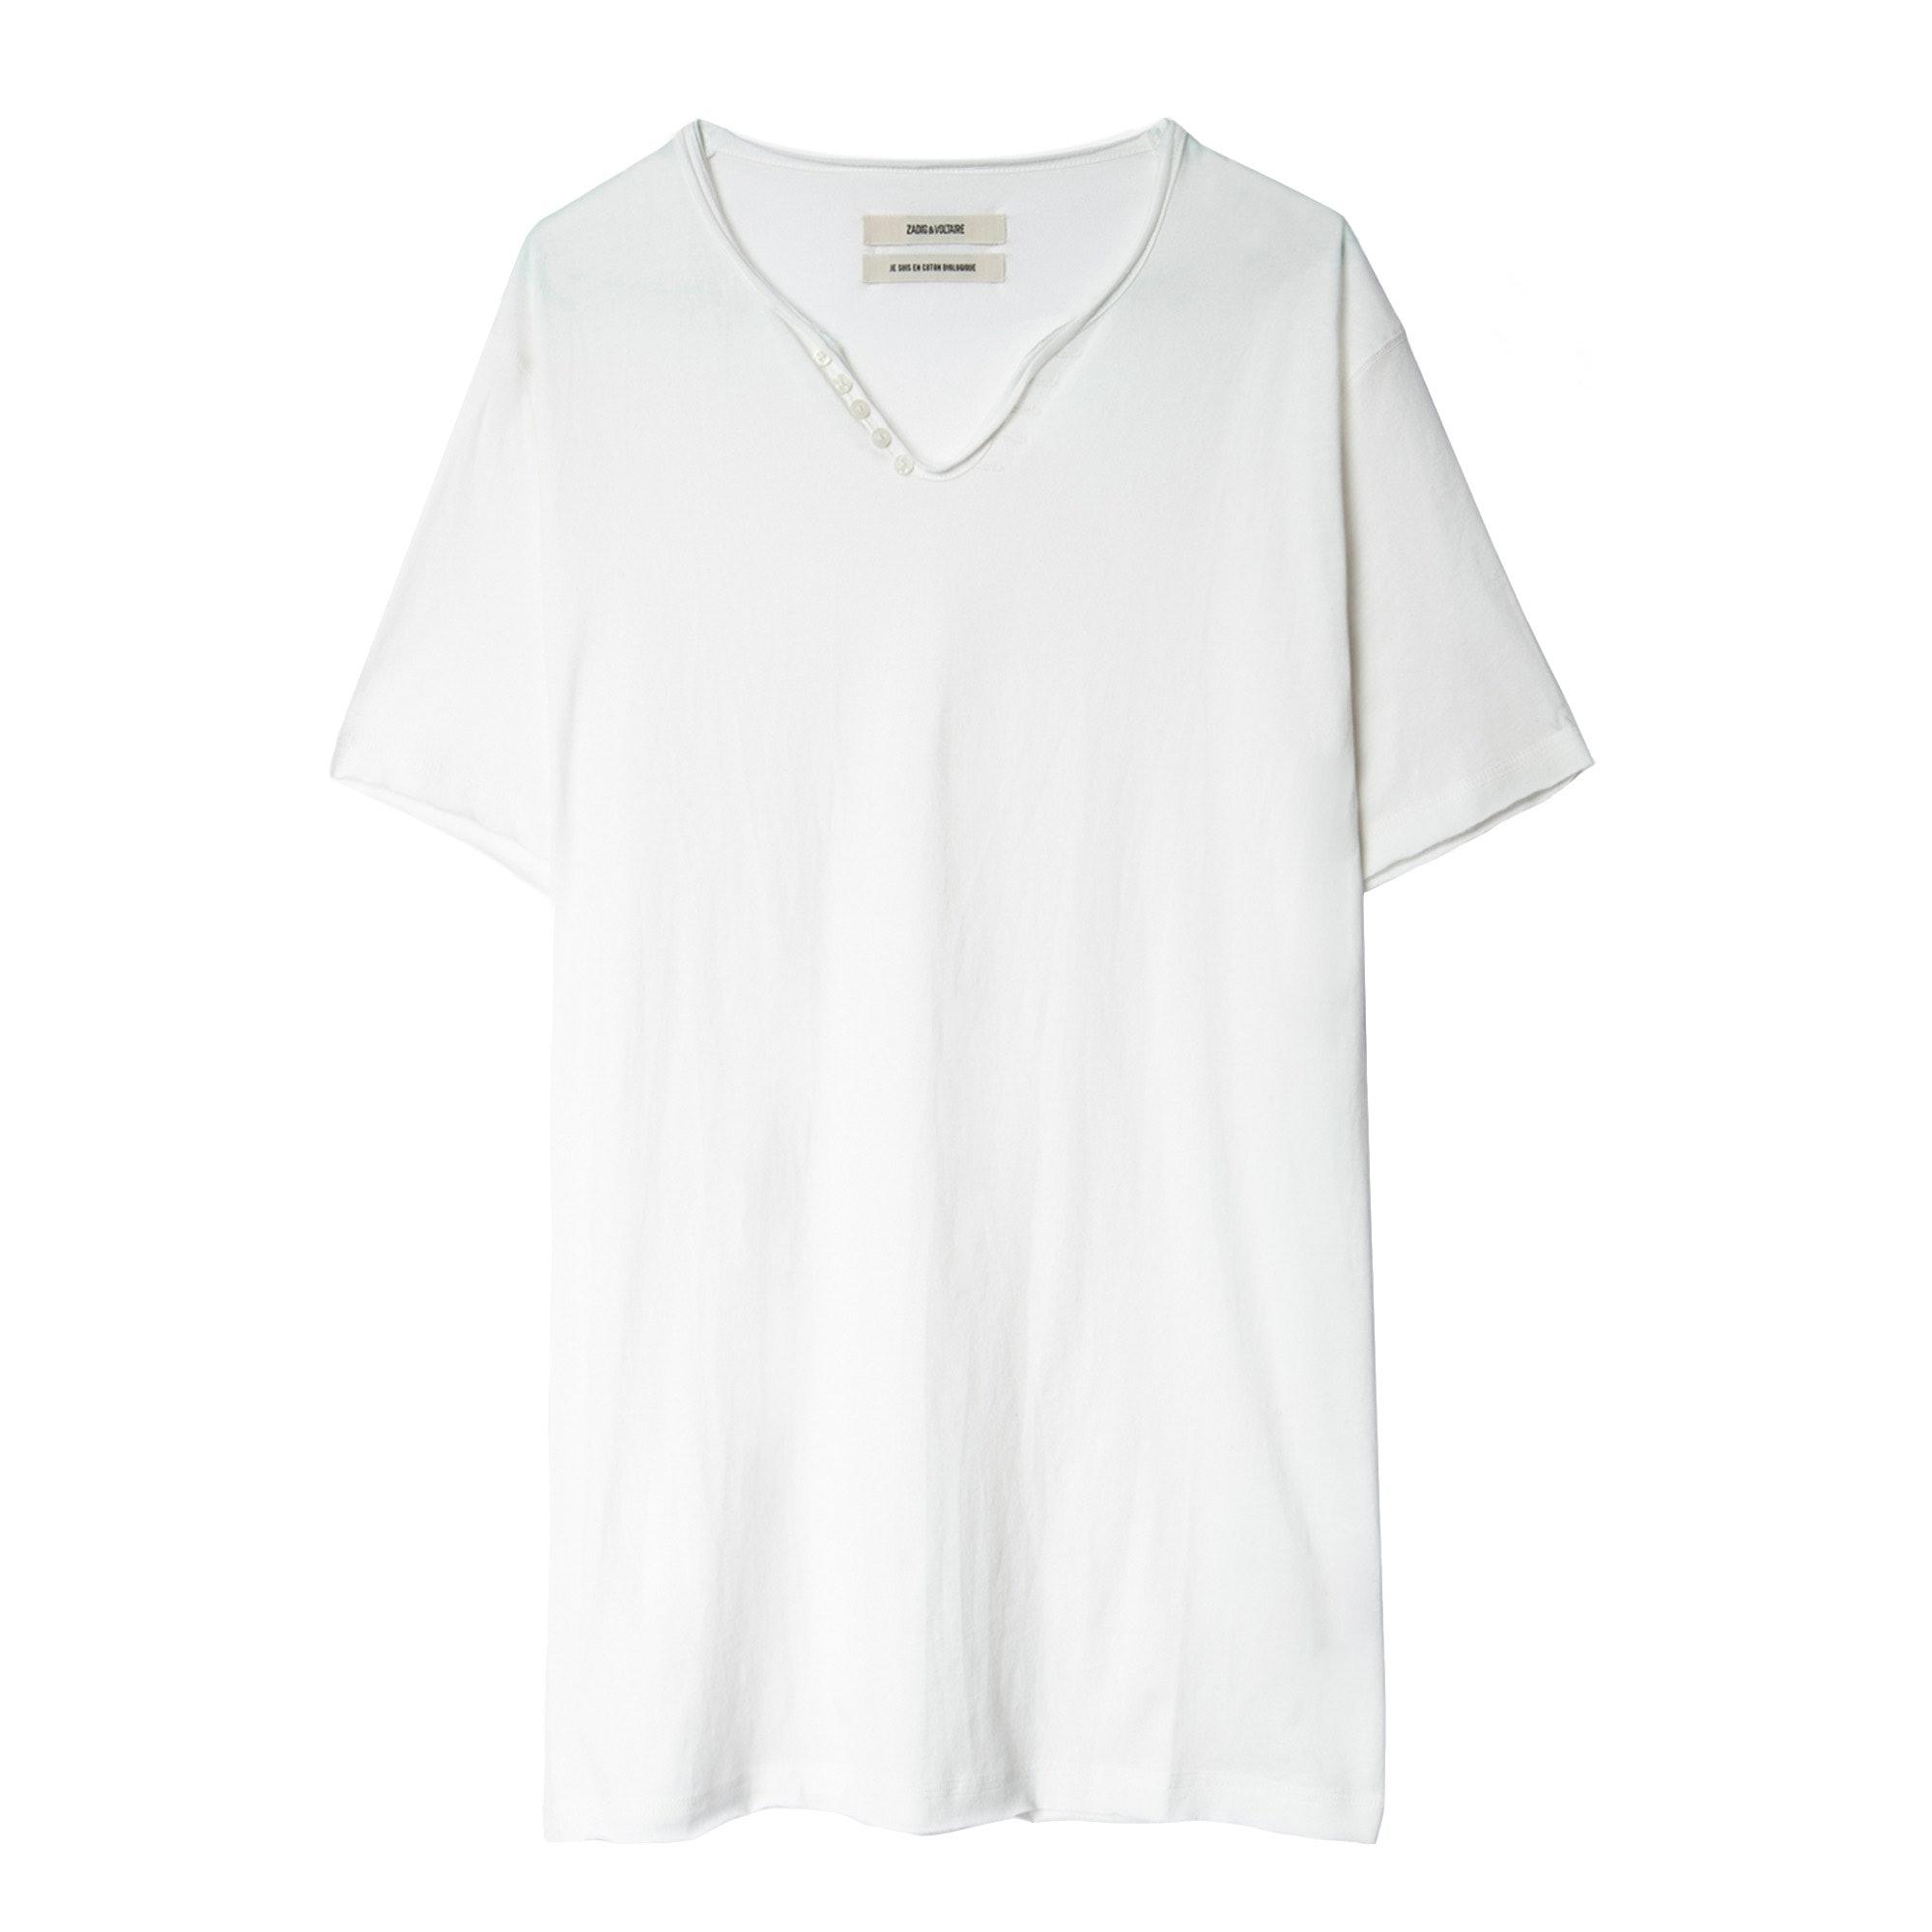 T-shirt Monastir - Taille XL  - Zadig & Voltaire - Modalova